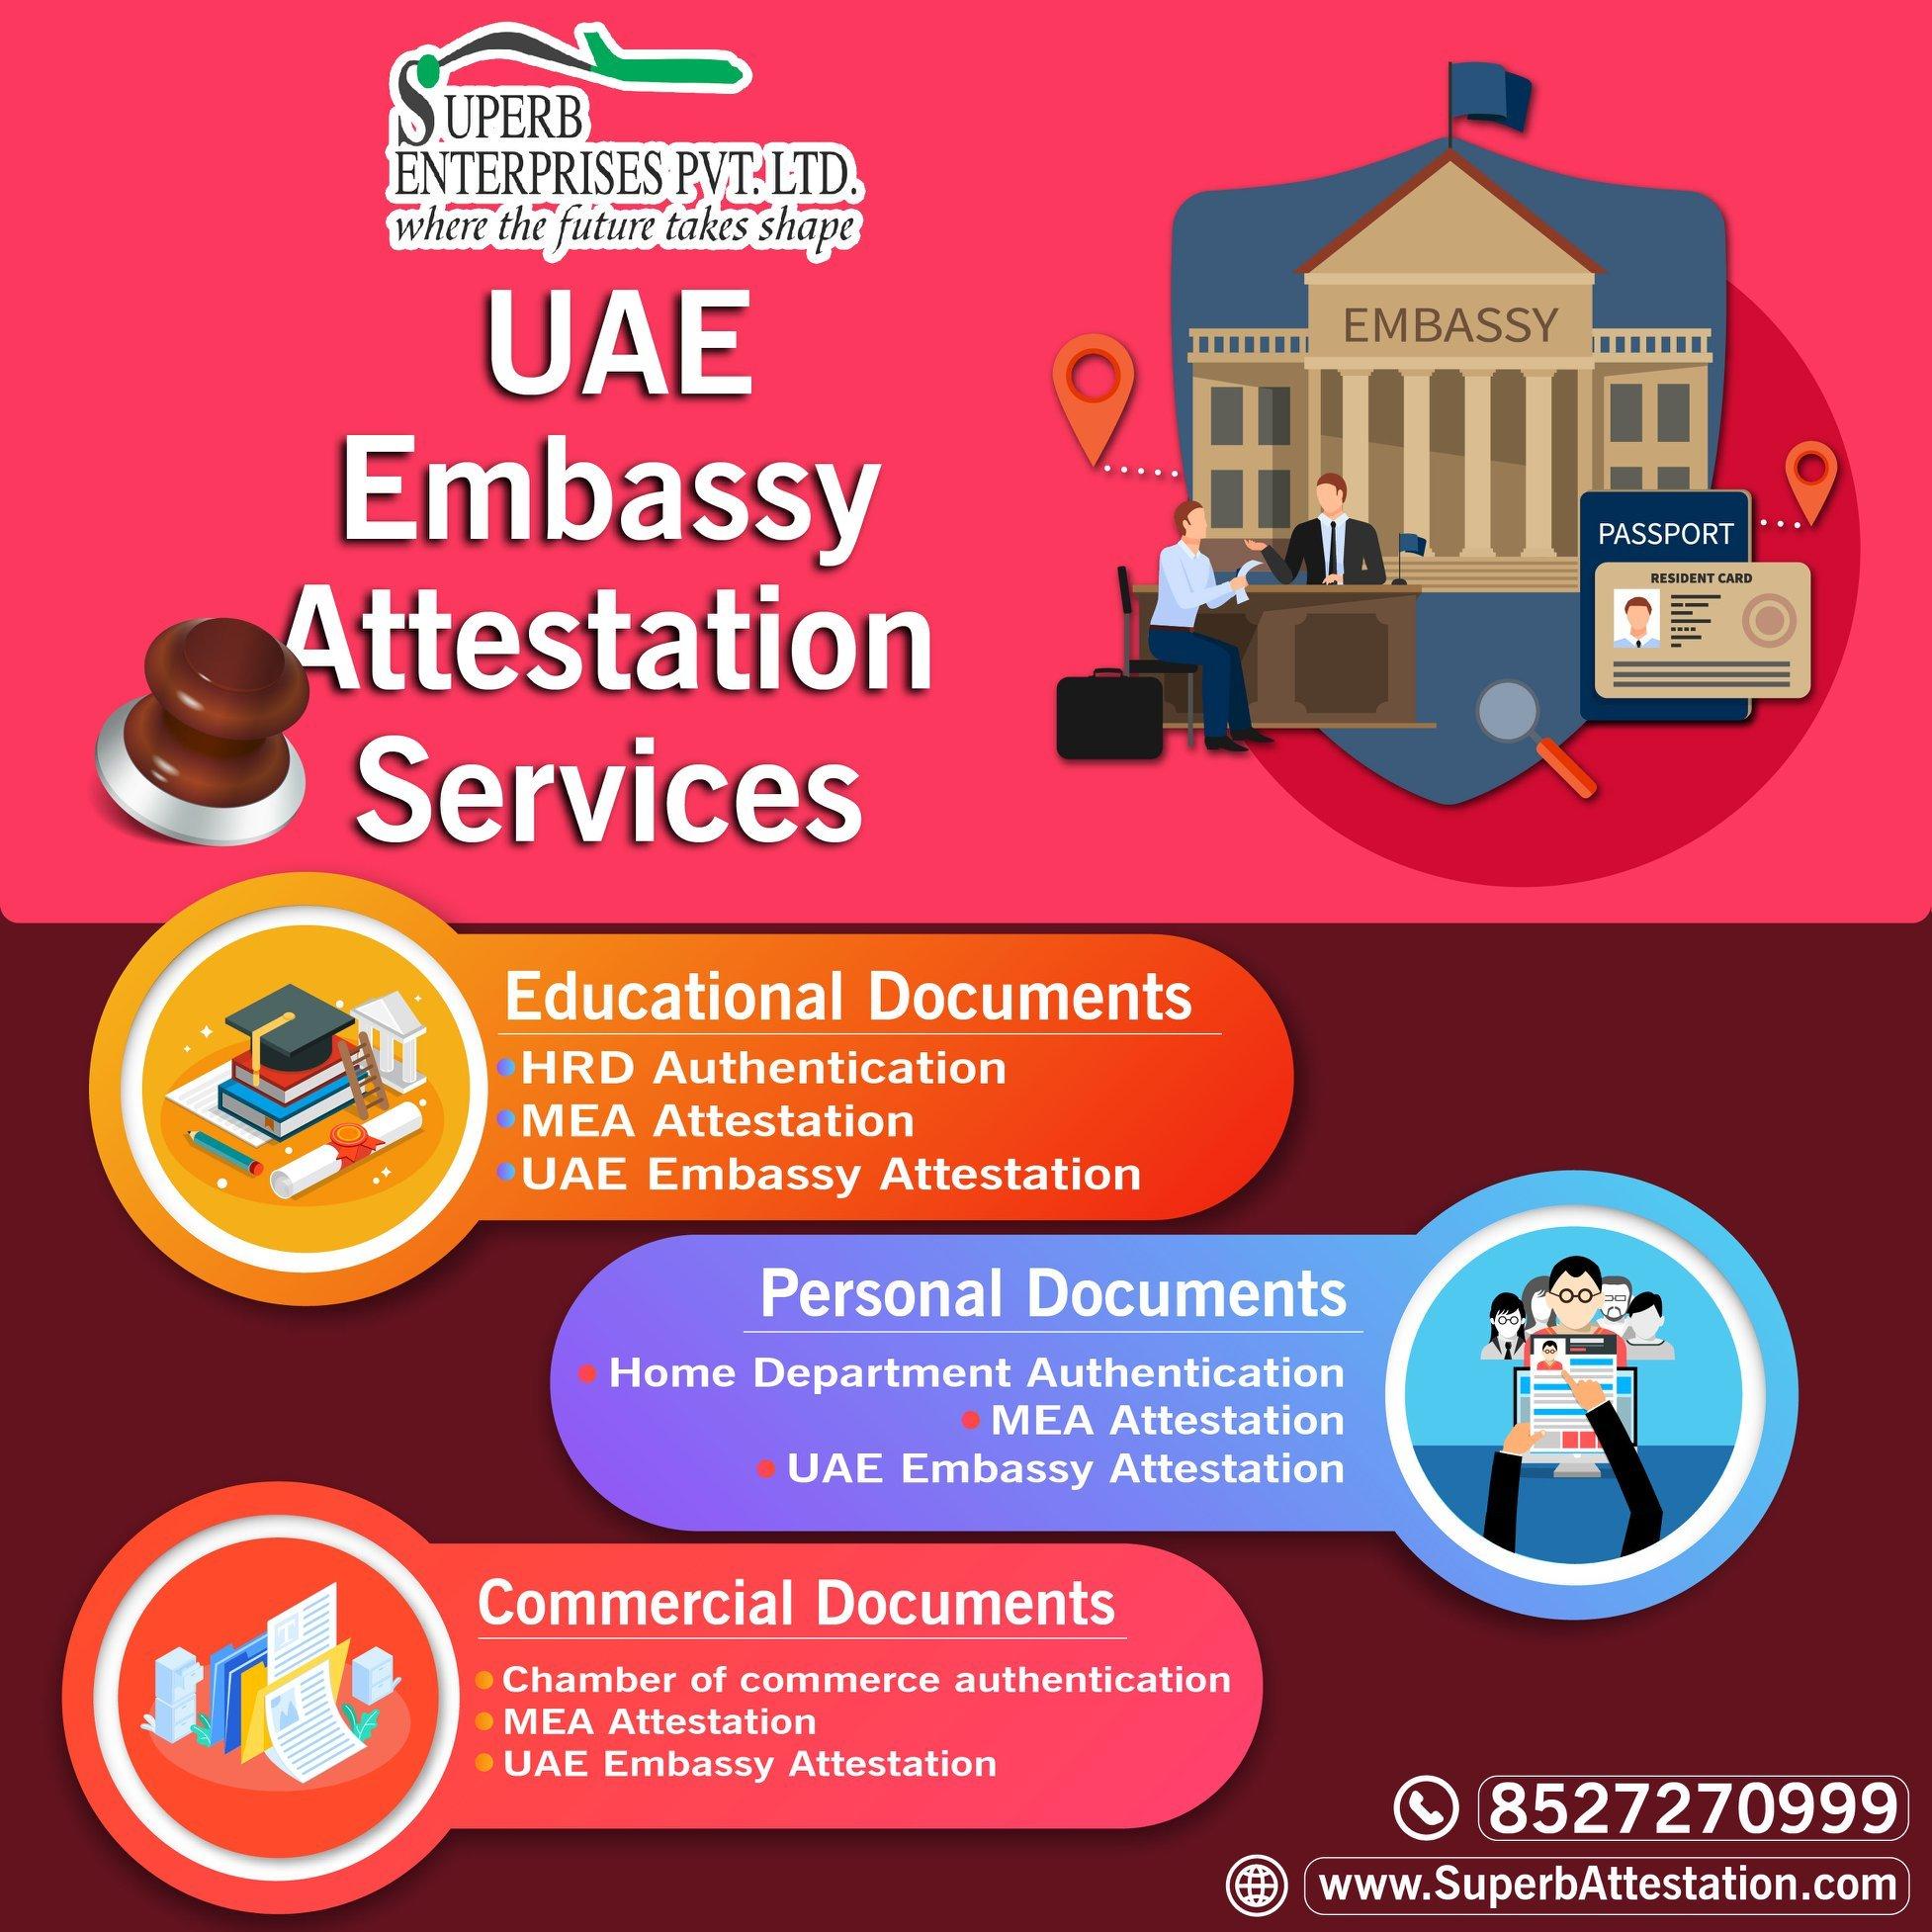 Document Attestation for UAE